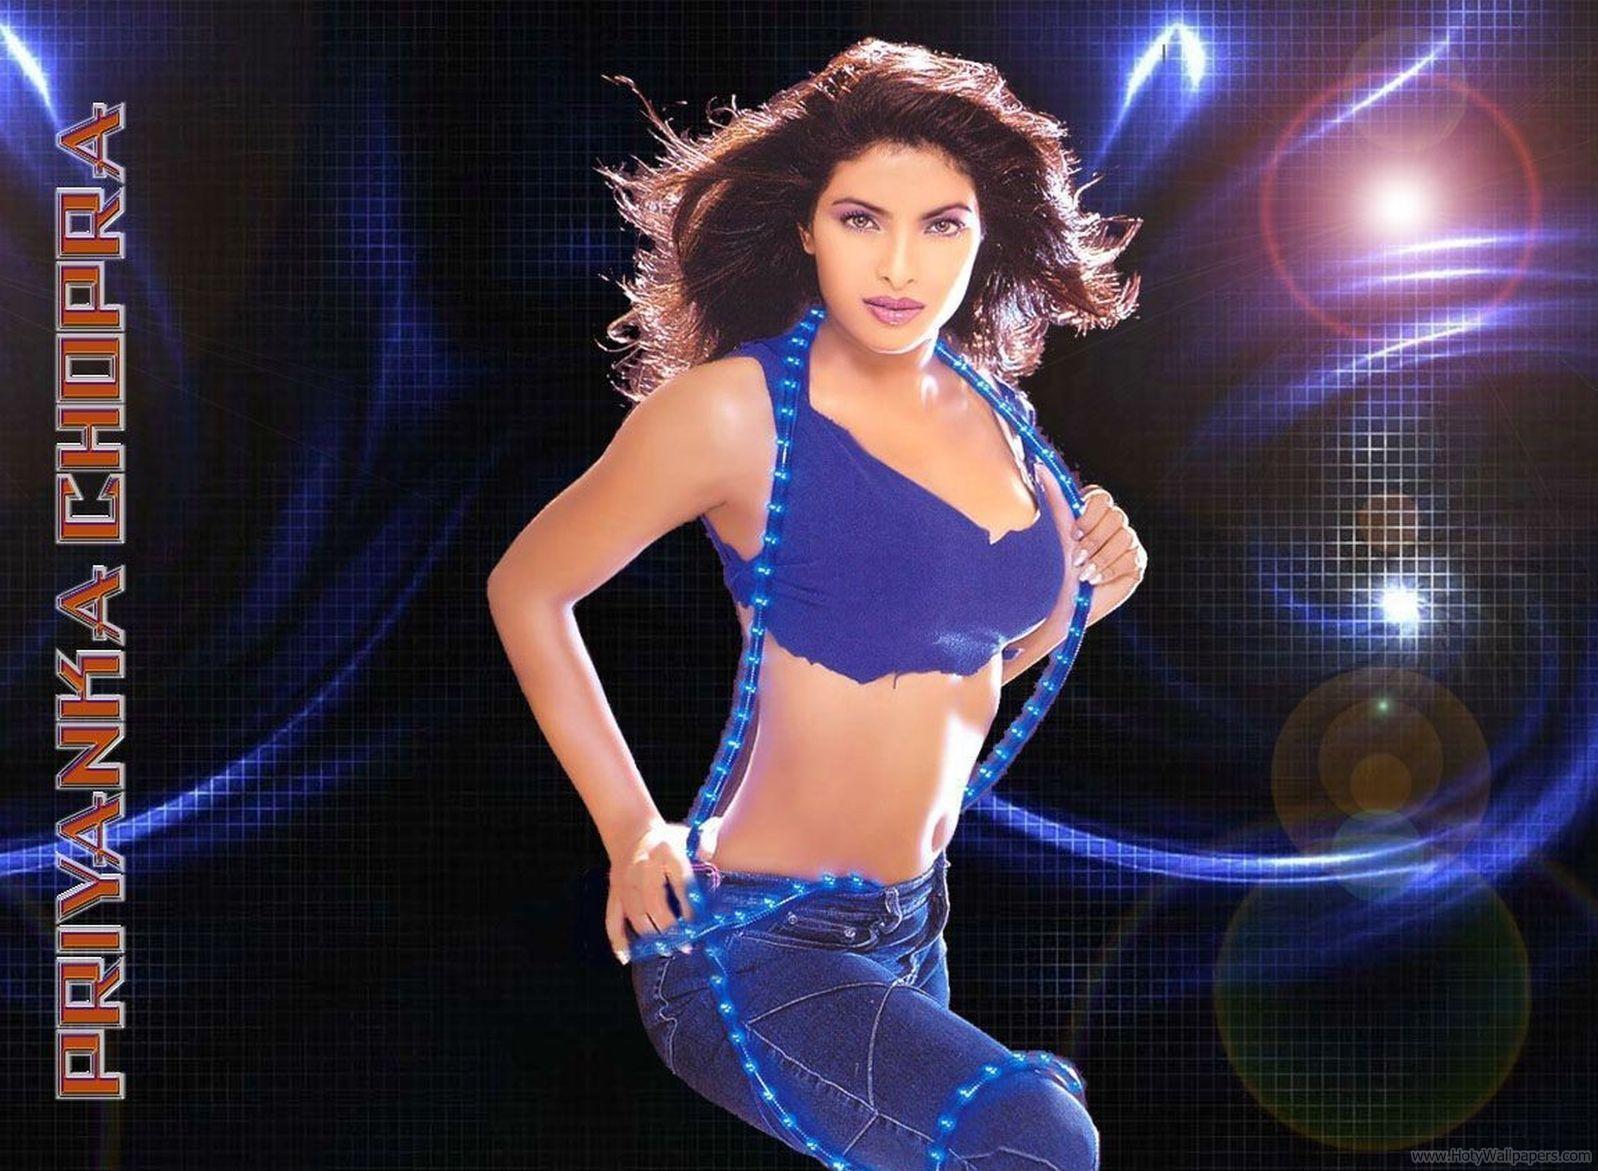 http://1.bp.blogspot.com/-xMwVlxGmHIE/TwhOgJPeulI/AAAAAAAAC3M/5Z4wxiaB_RM/s1600/Priyanka_Chopra_Wallpaper-Agneepath-Movie-2012.jpg